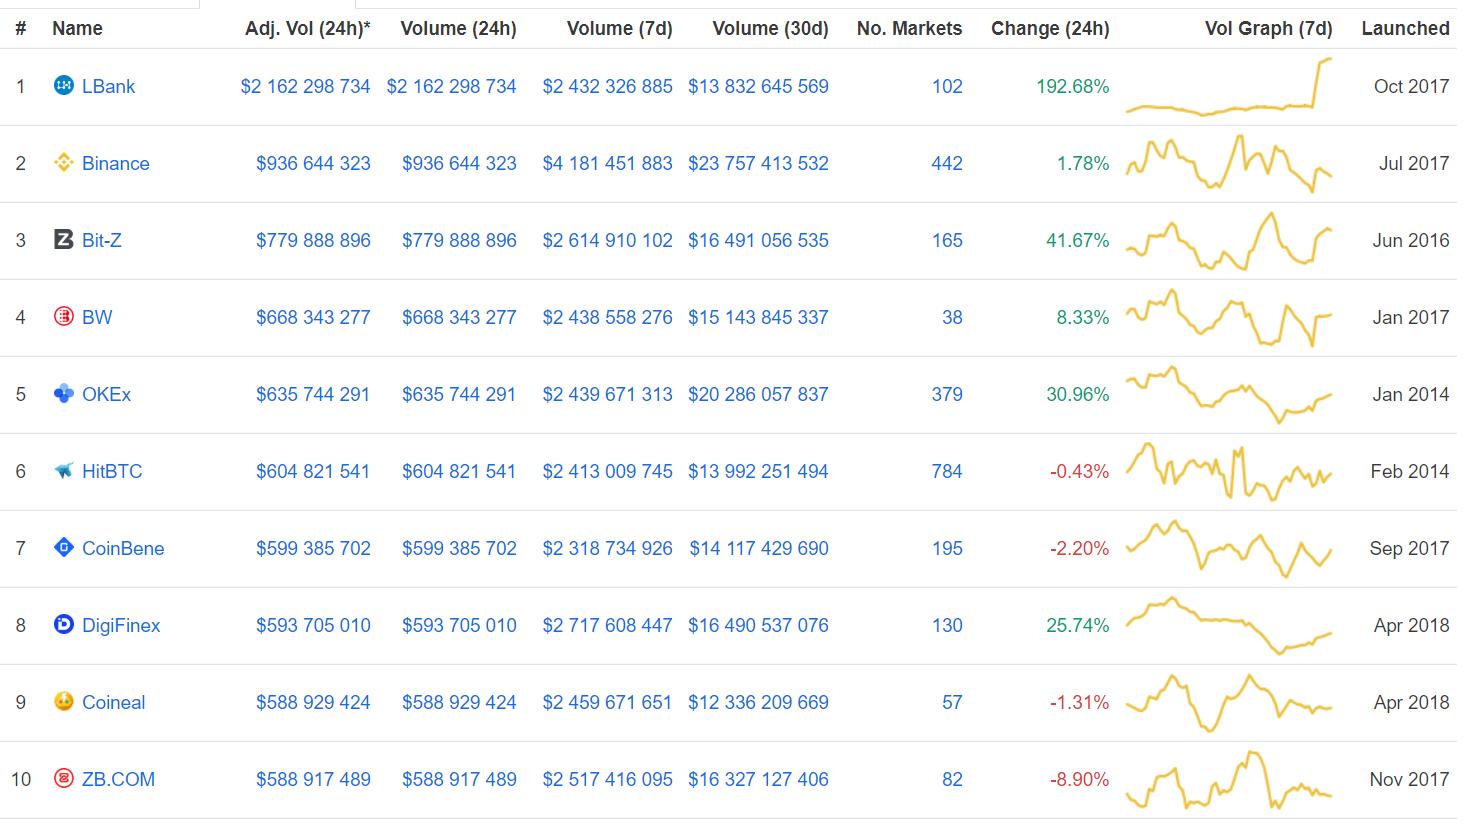 Резкий рост объемов биржи LBank сместил Binance на второе место